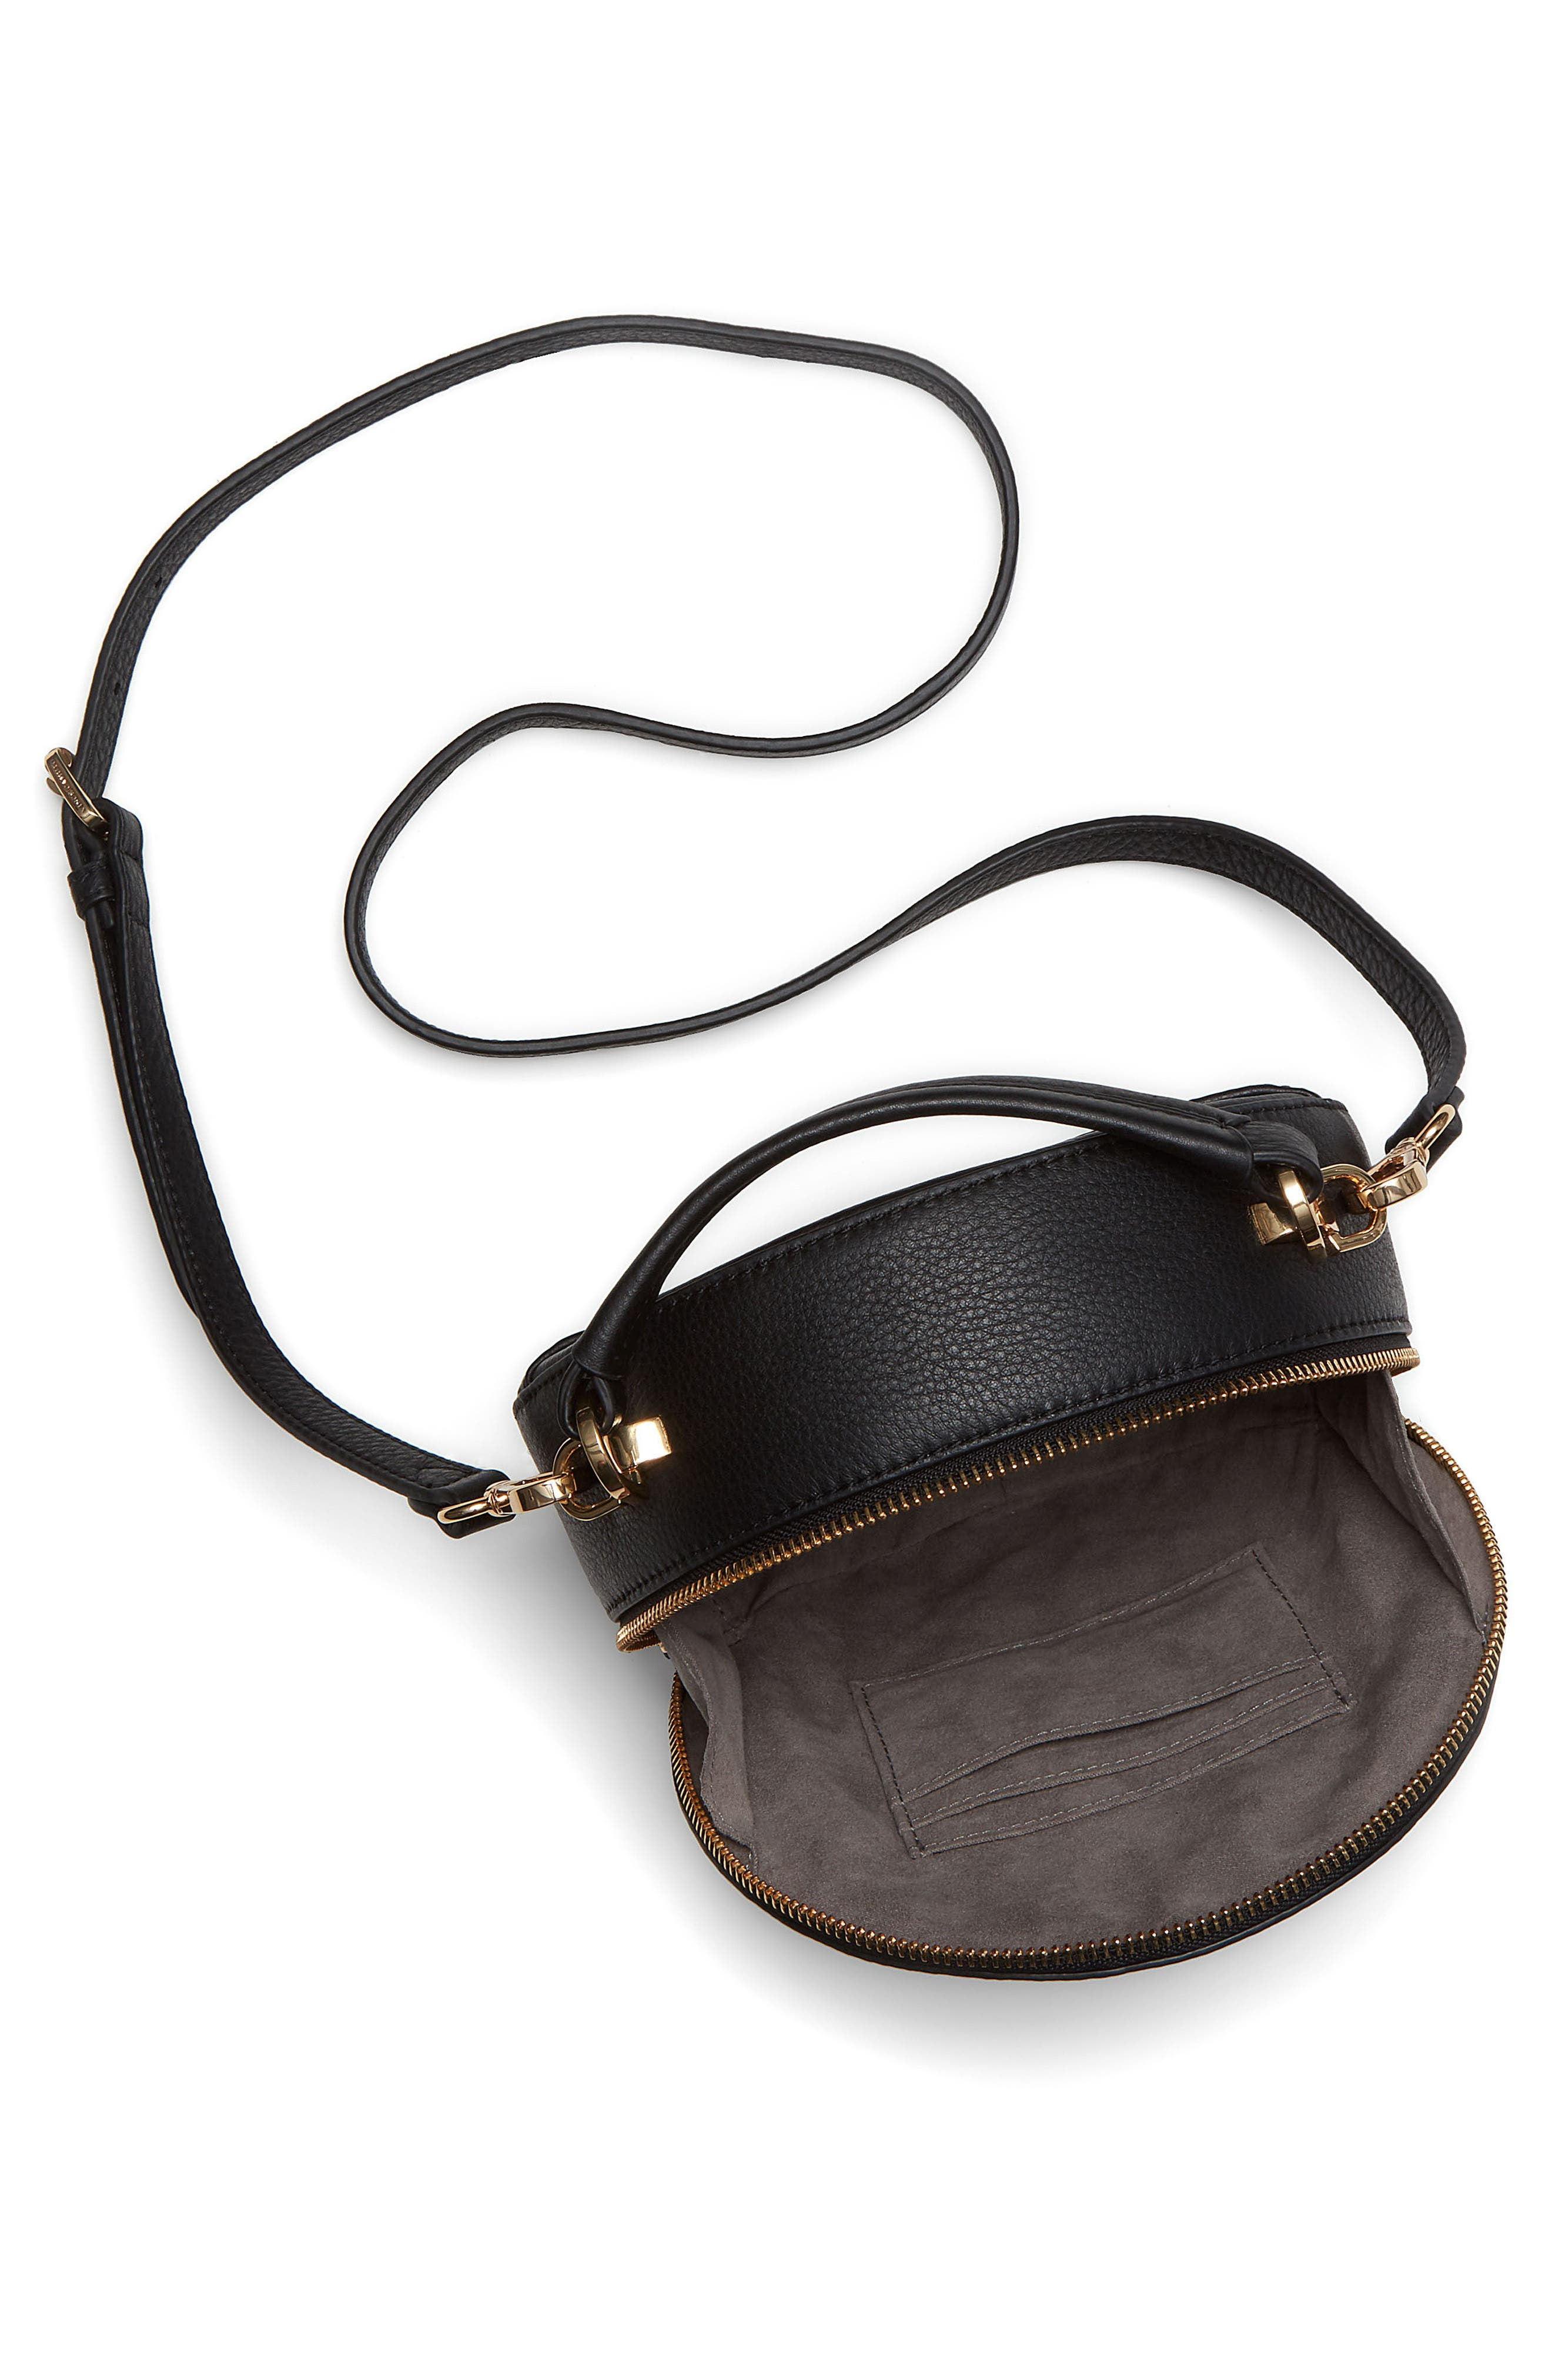 Bray Leather Crossbody Bag,                             Alternate thumbnail 3, color,                             Black